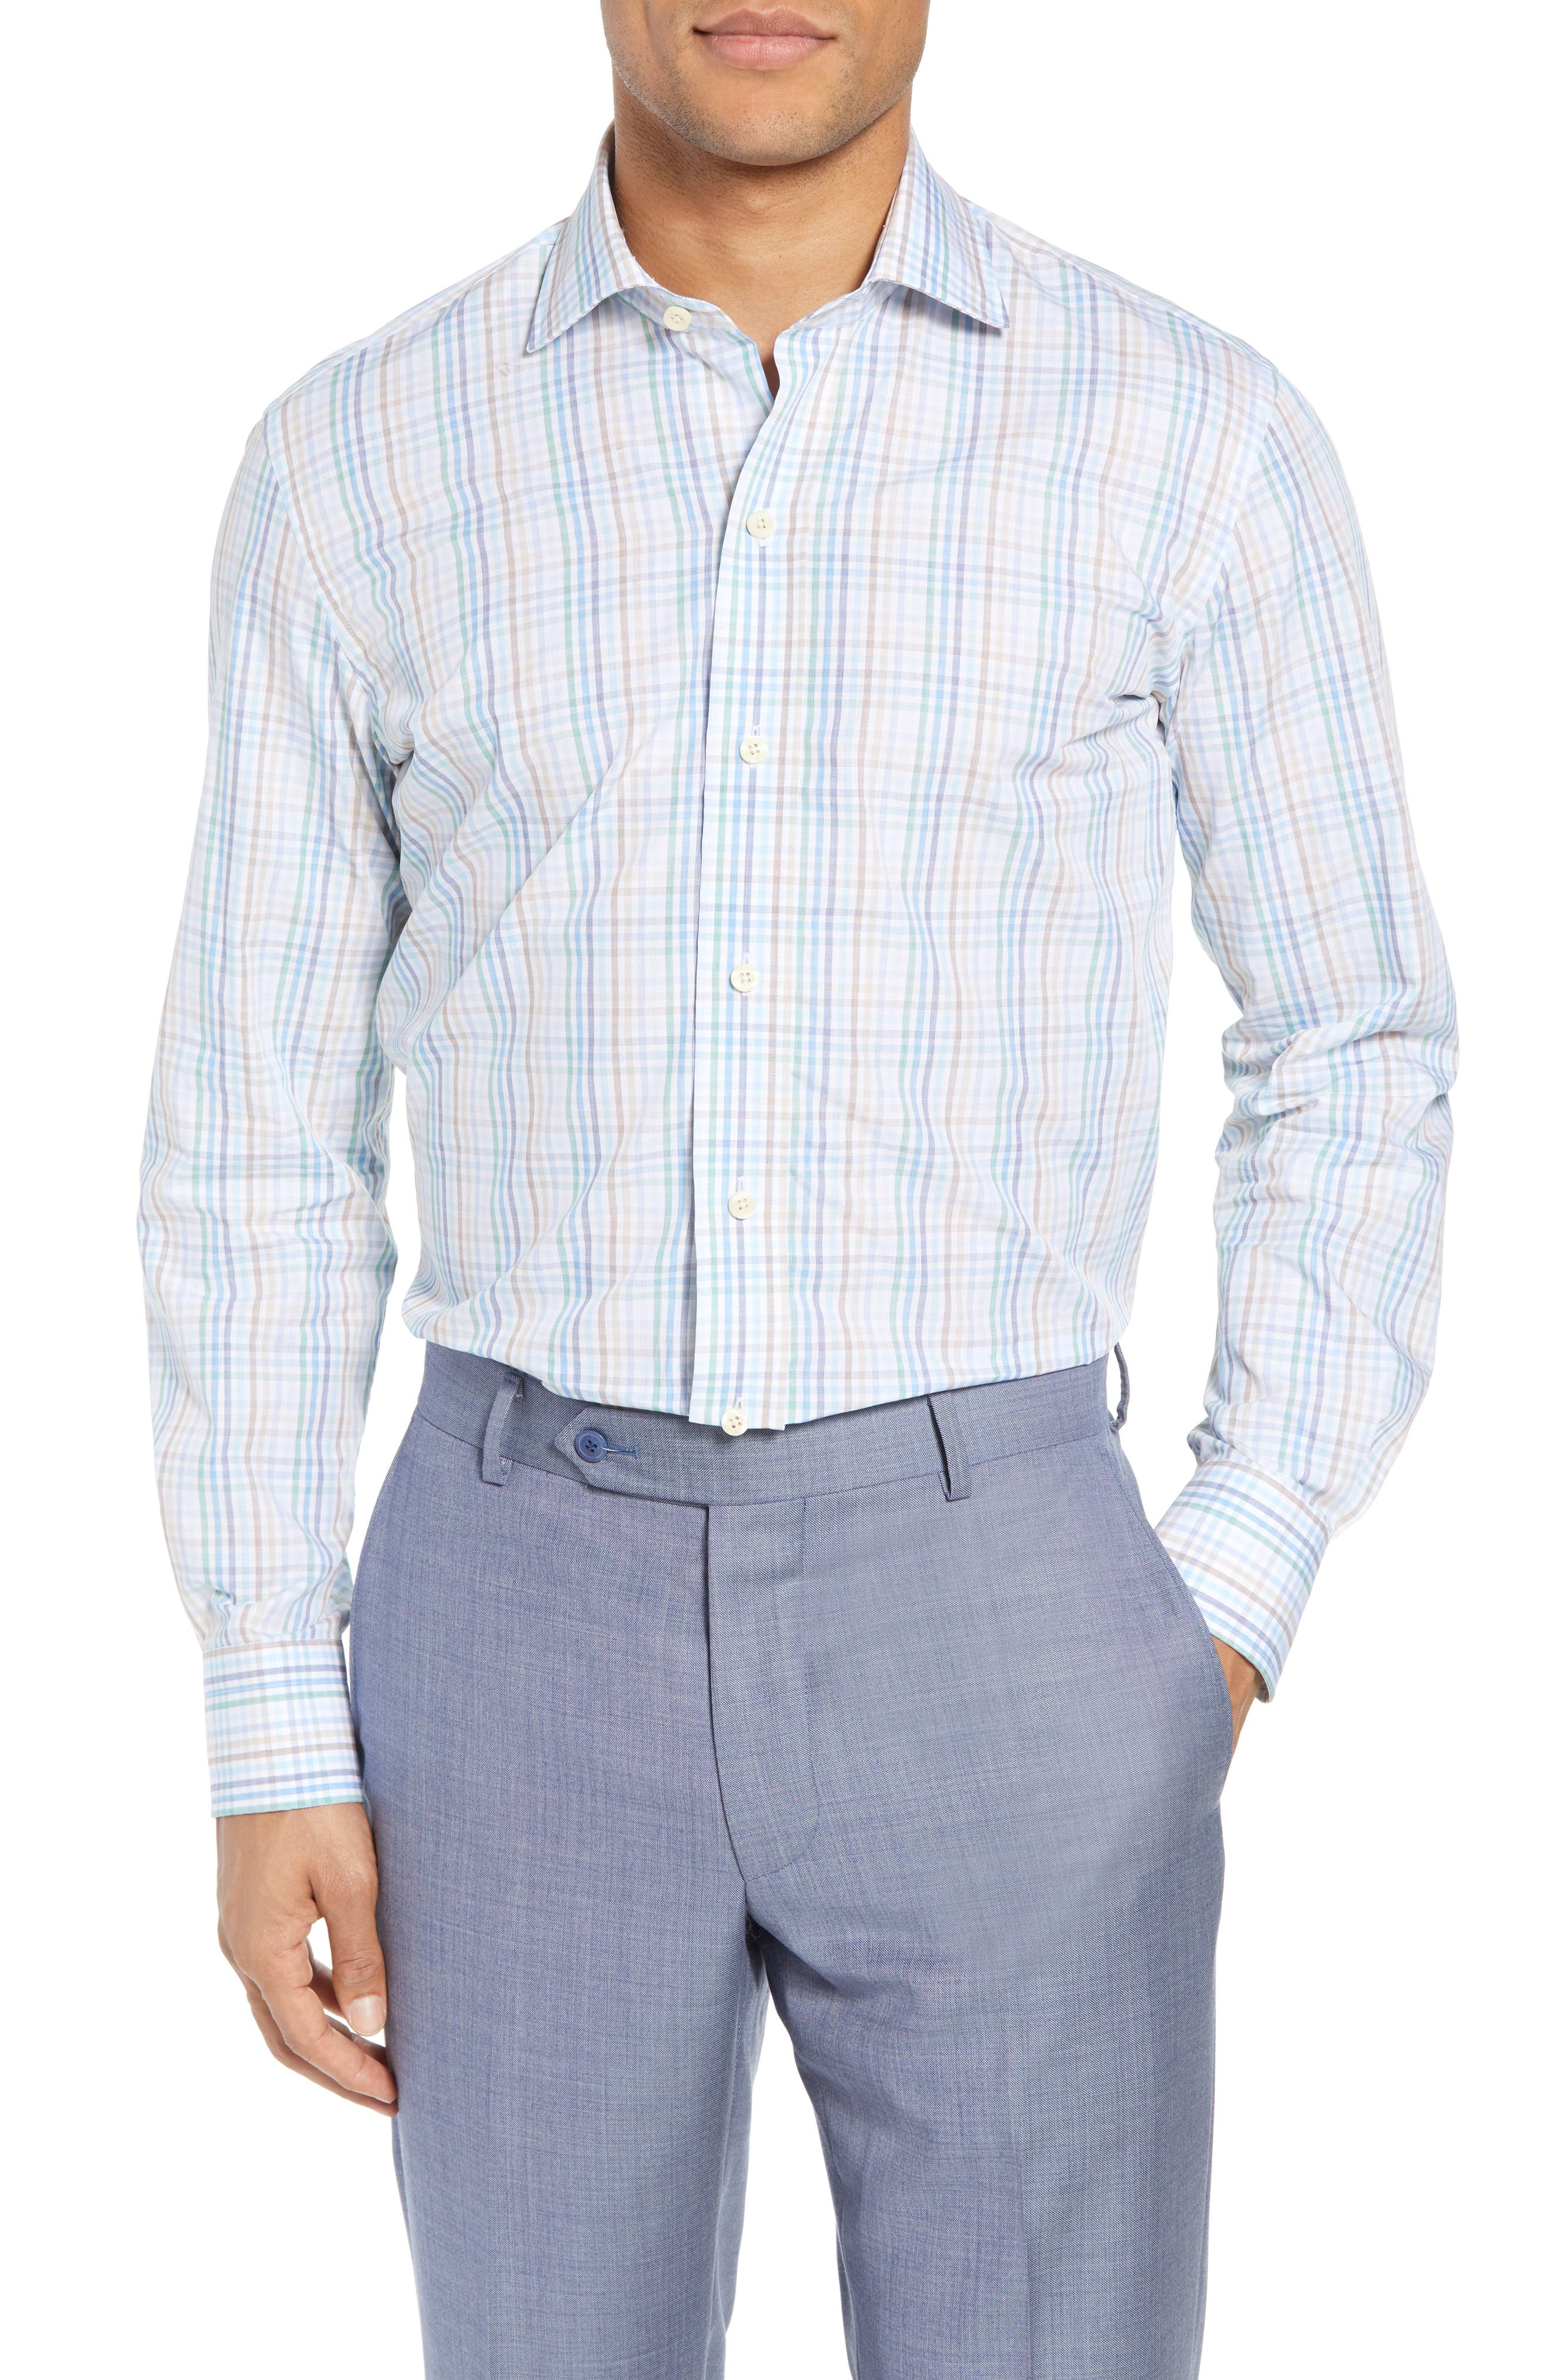 Albright Slim Fit Check Dress Shirt,                         Main,                         color, 308